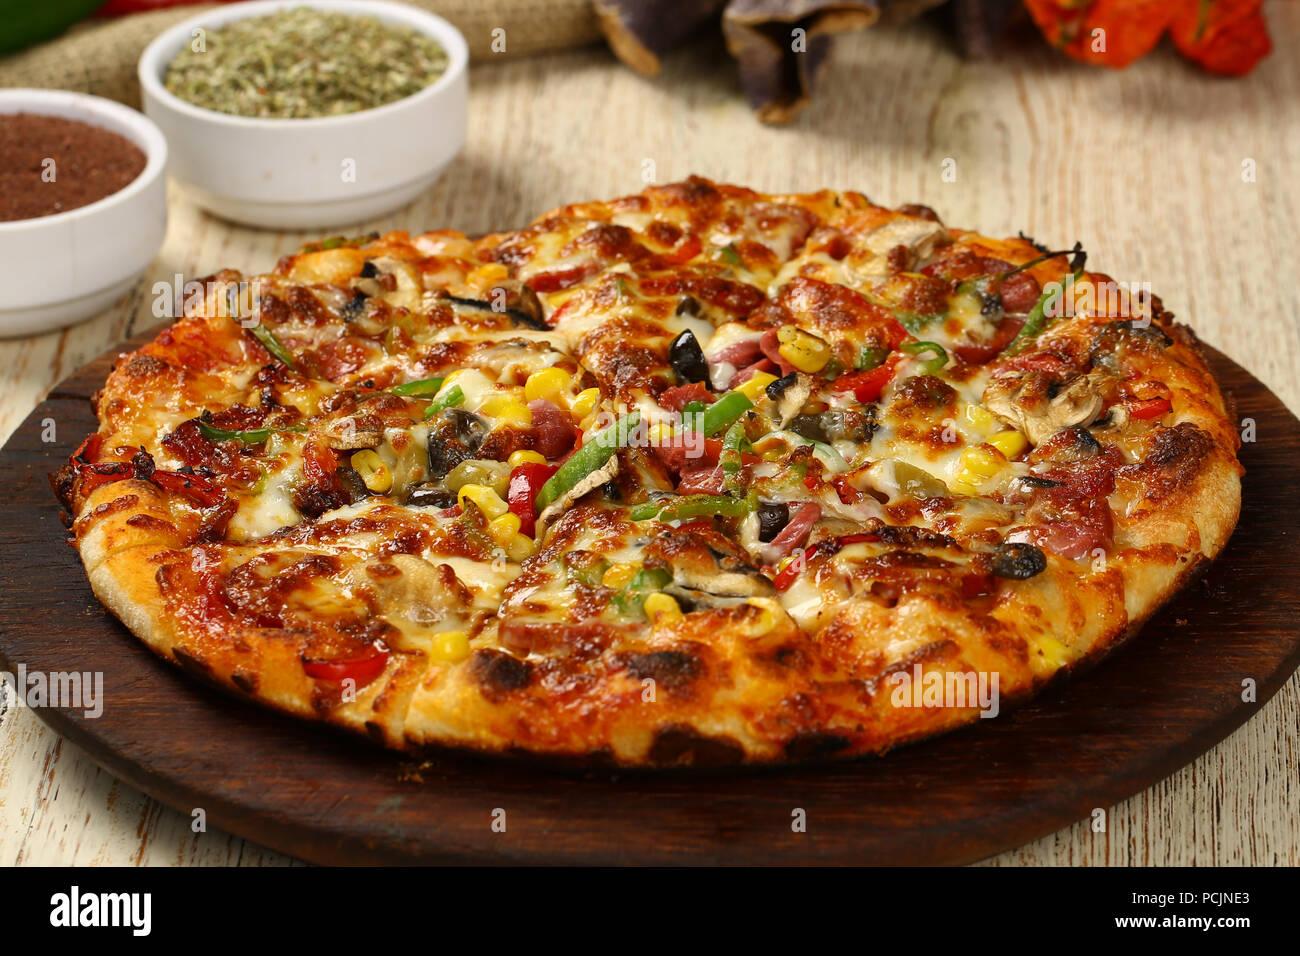 Deliciosa pizza italiana sobre la tabla de madera Imagen De Stock